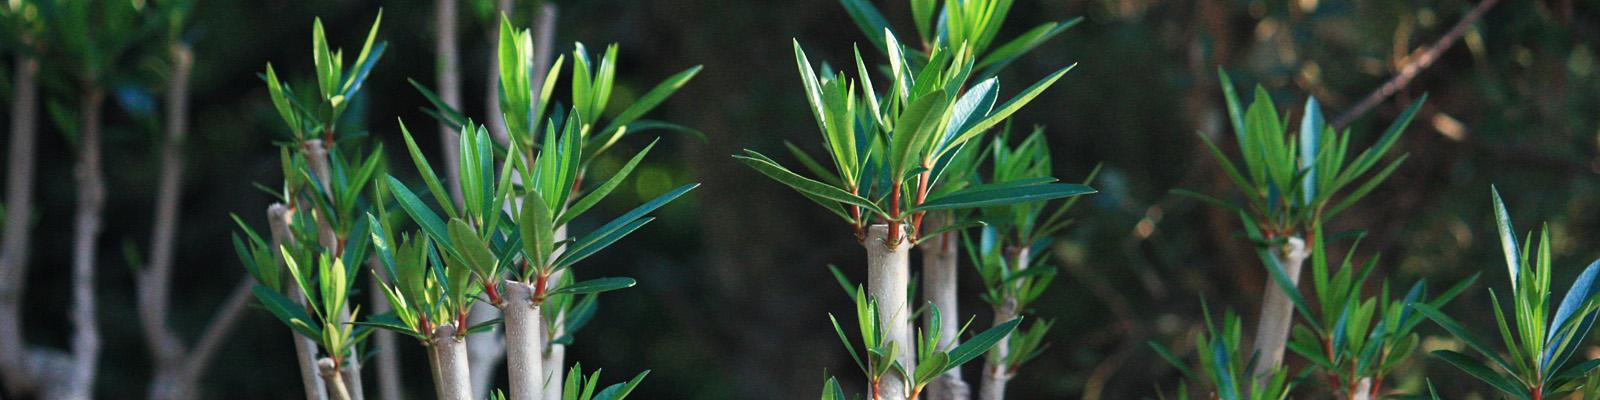 Green Parrot Gardens | Garden Maintenance | Oleander Clean Up